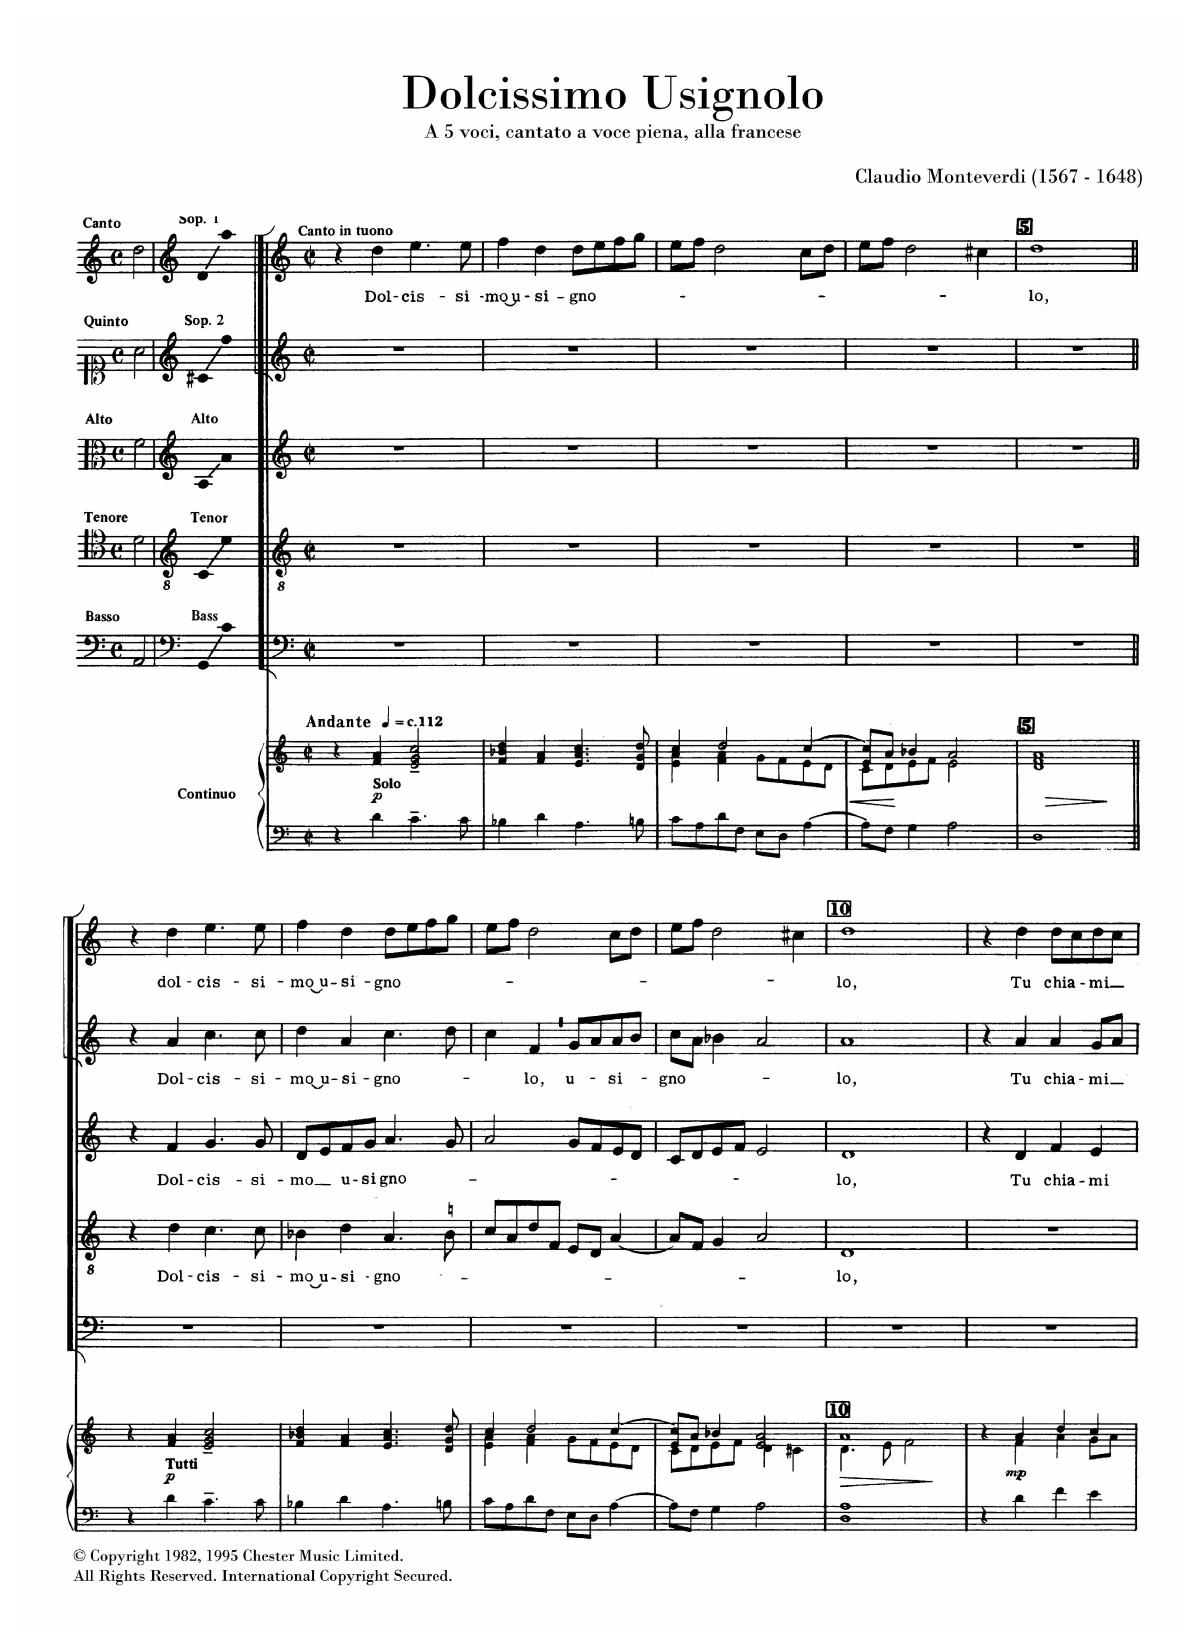 Dolcissimo Usignolo (arr. Anthony Petti) Sheet Music